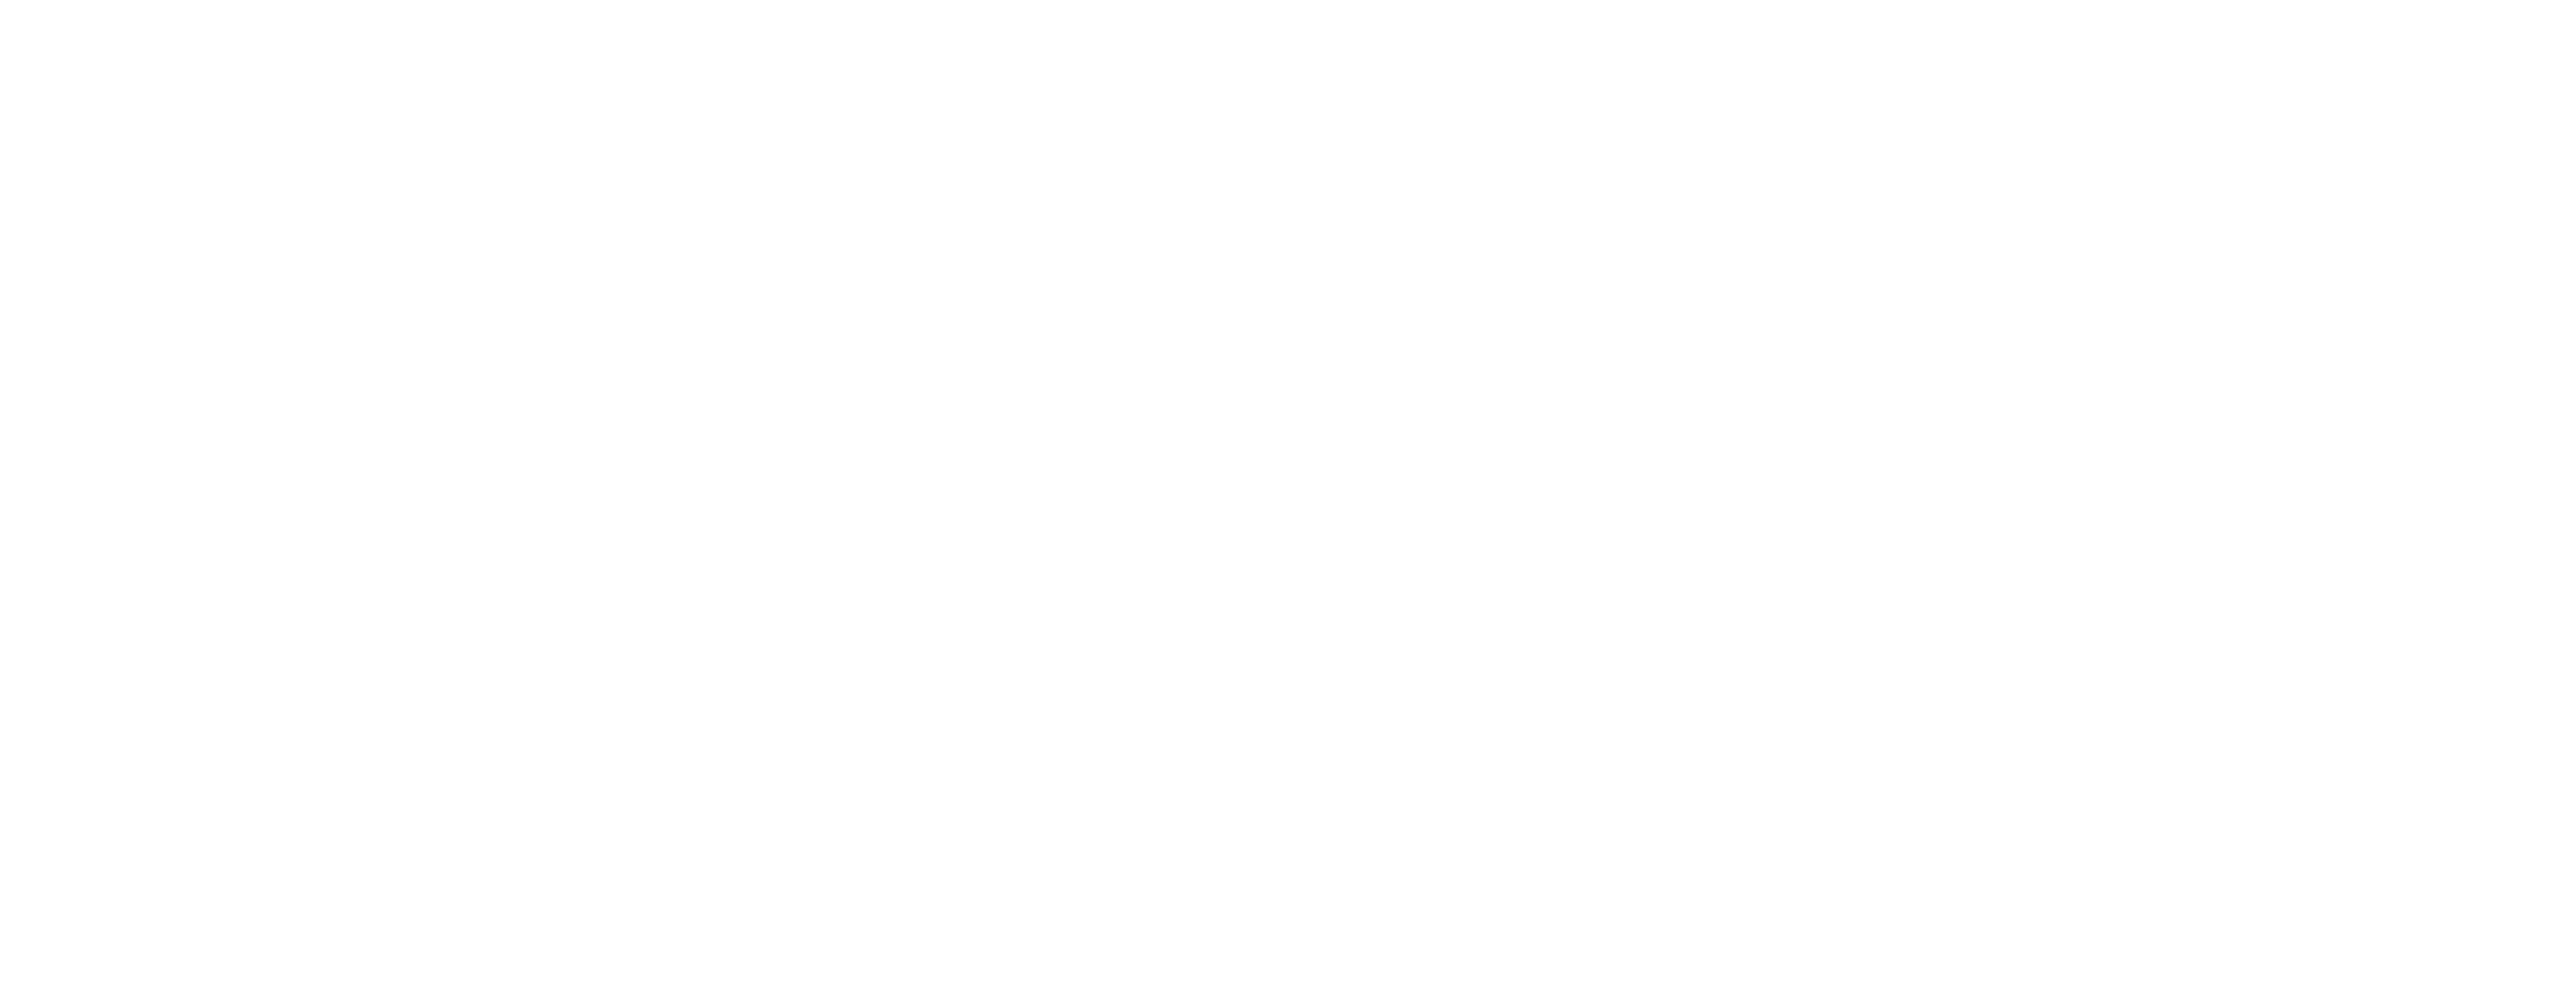 The Judah Group